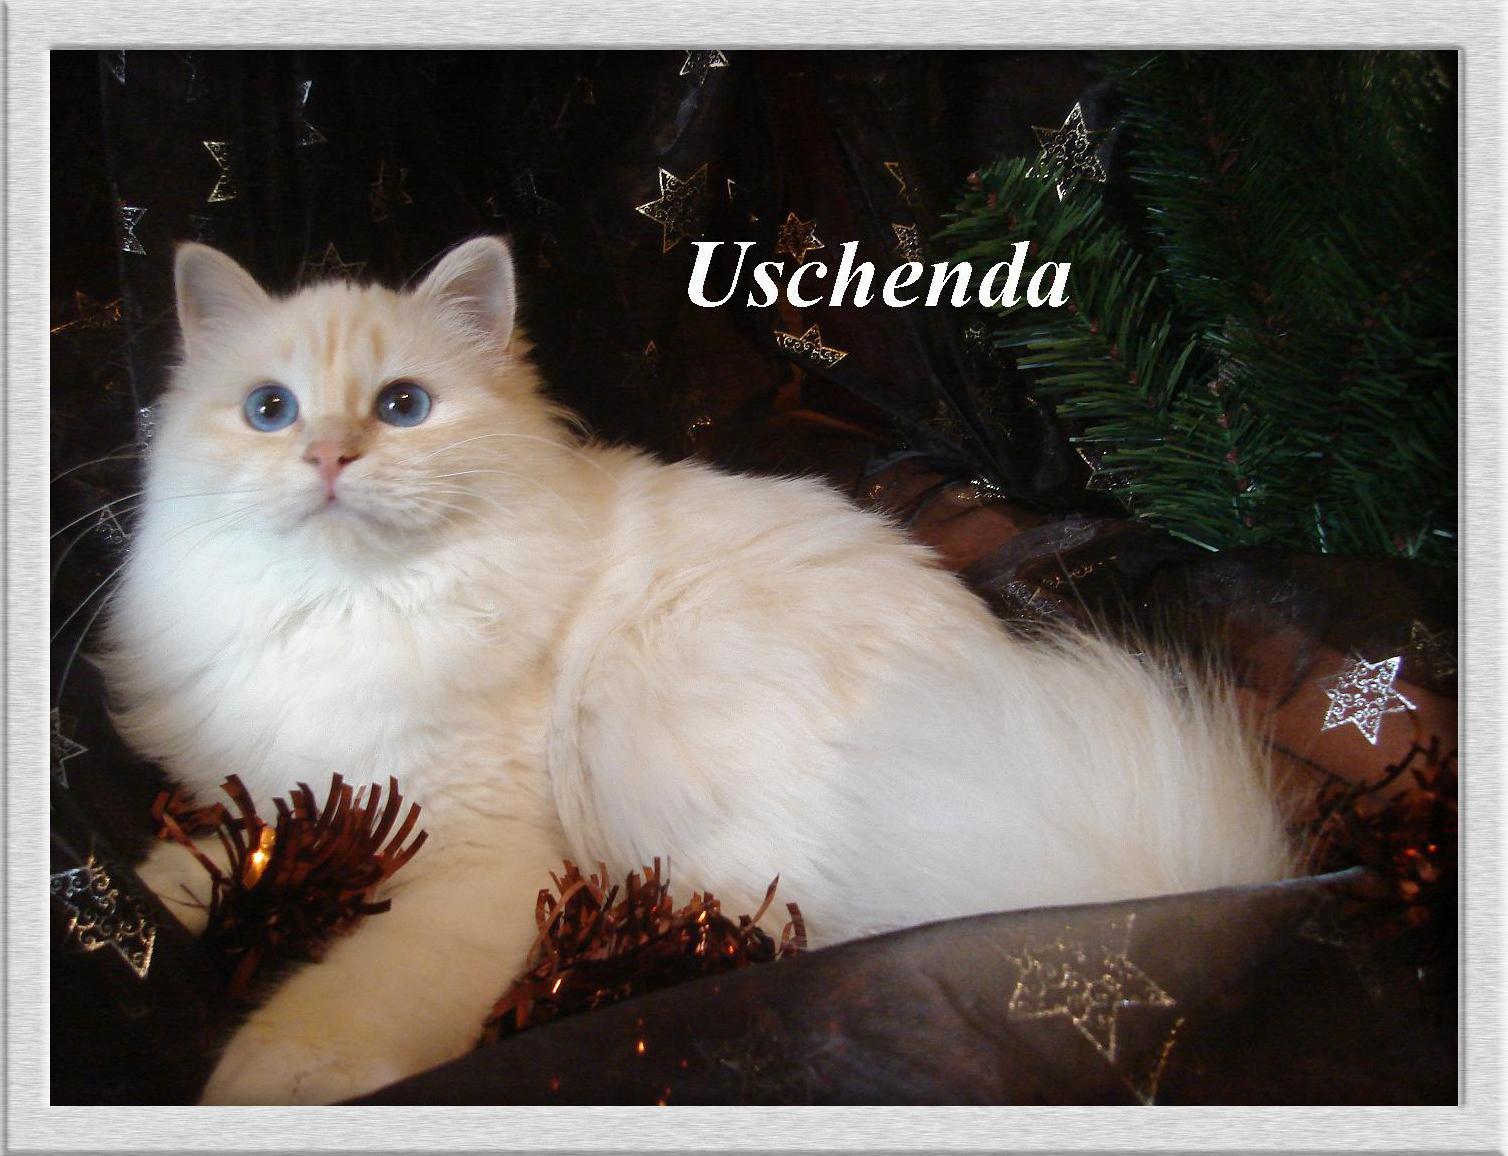 Uschenda the cosy One